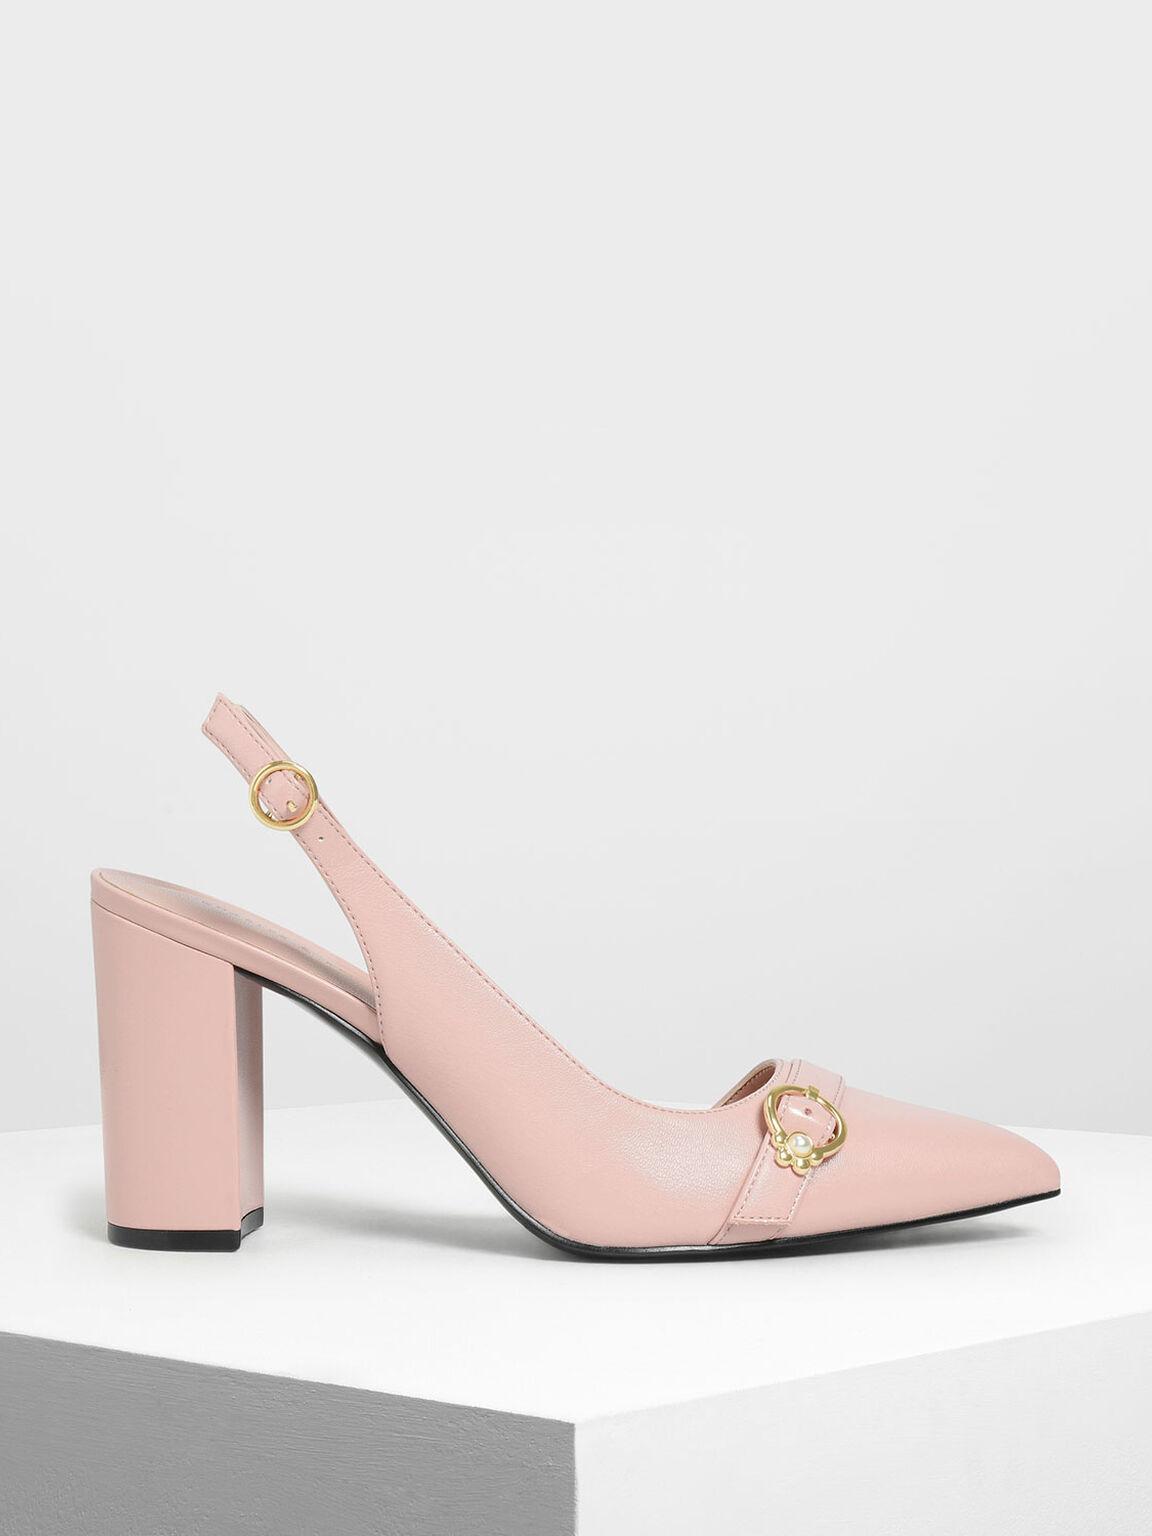 Embellished Asymmetrical Heels, Peach, hi-res